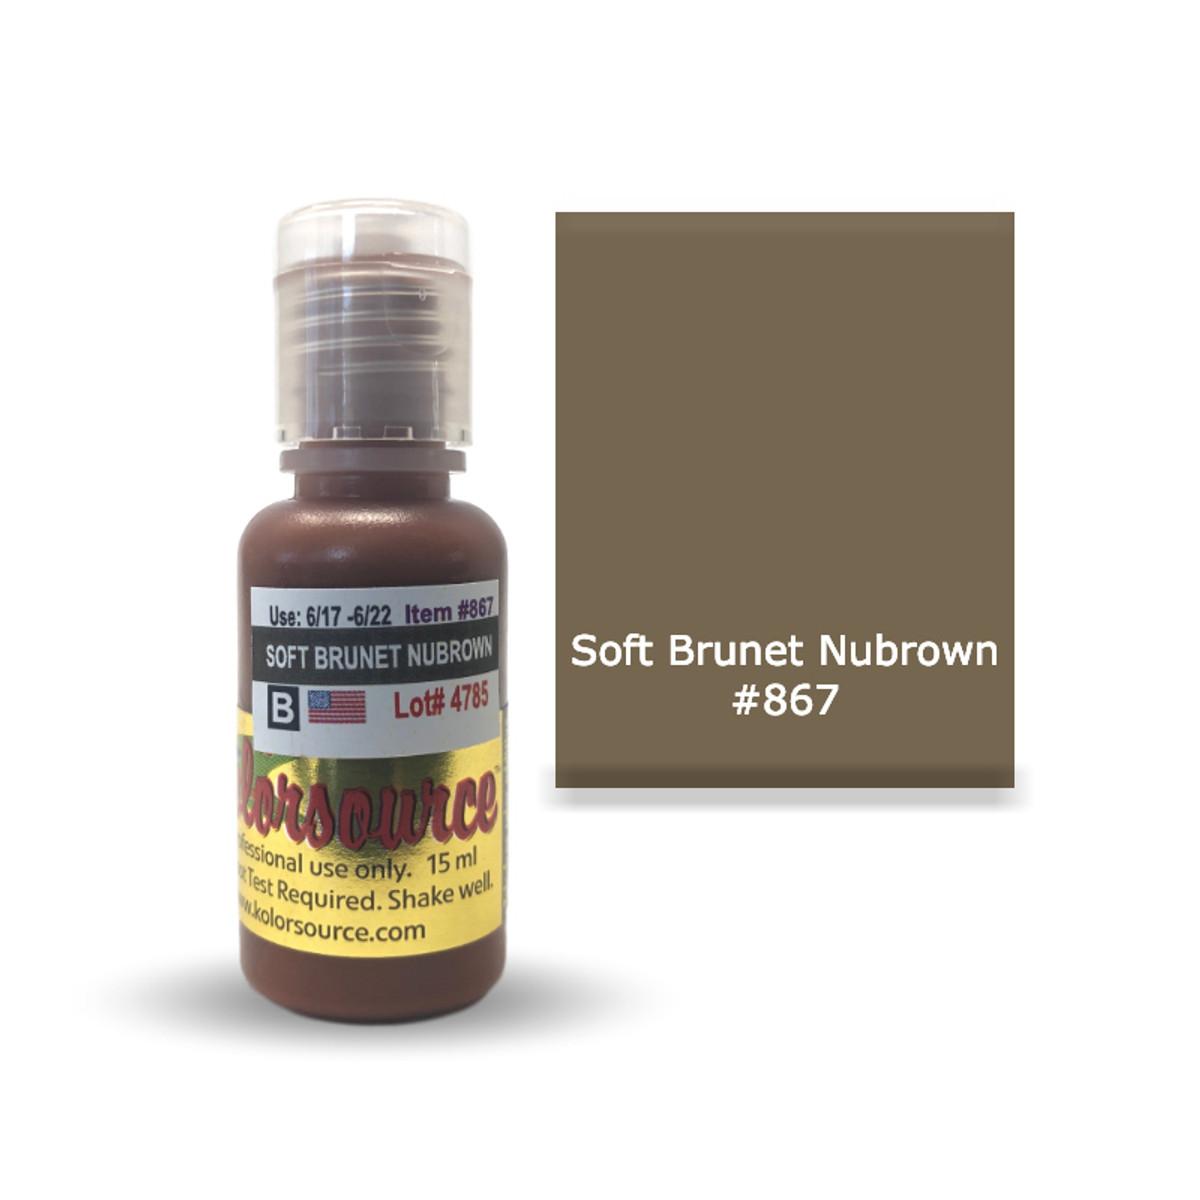 Kolorsource Permanent Makeup Pigment (PMU) Soft Brunet Nubrown #867 - 15ml